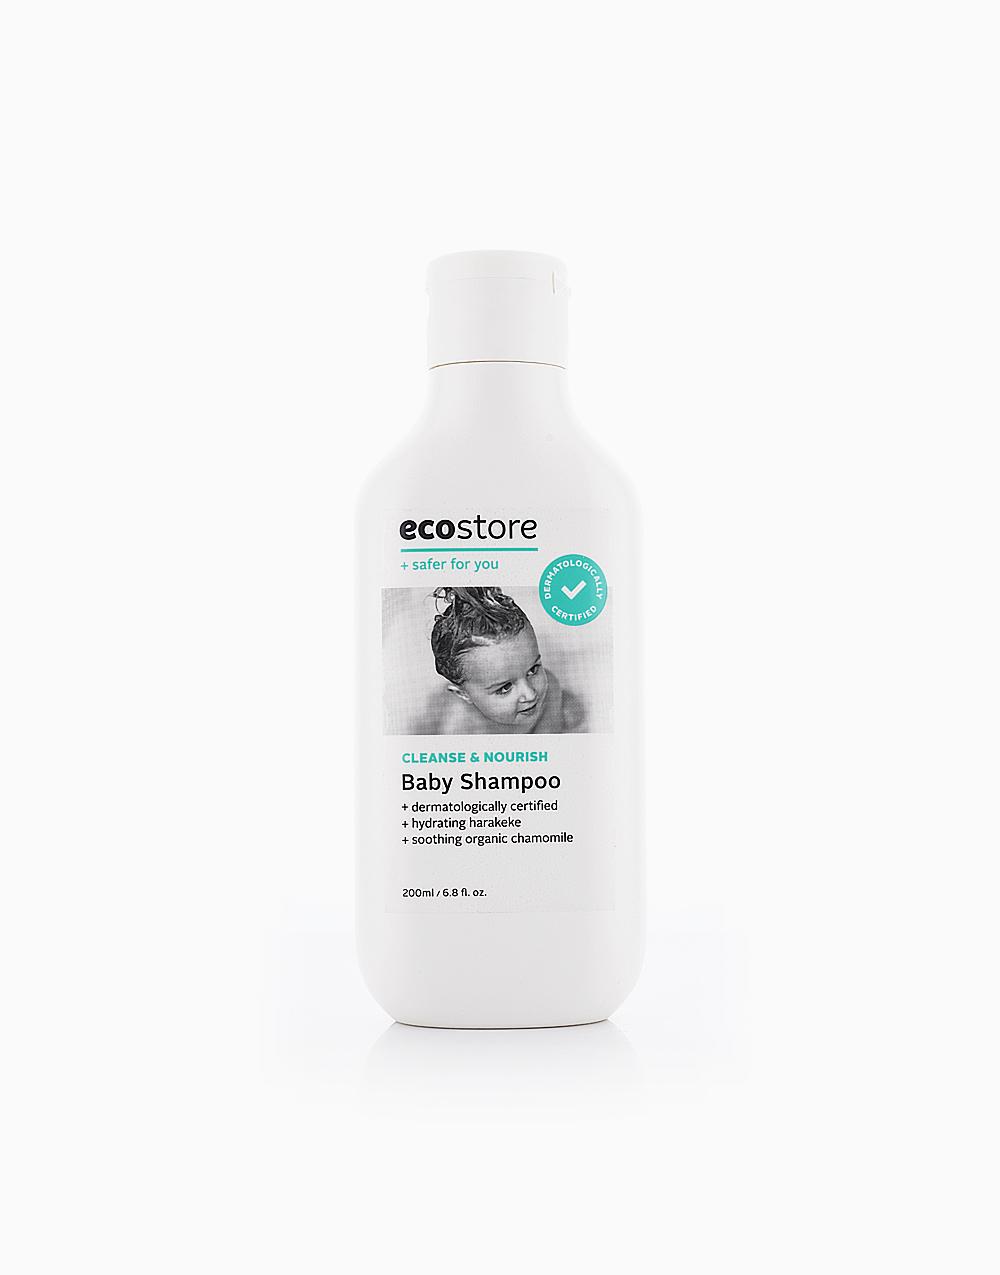 Baby Shampoo (200ml) by Ecostore